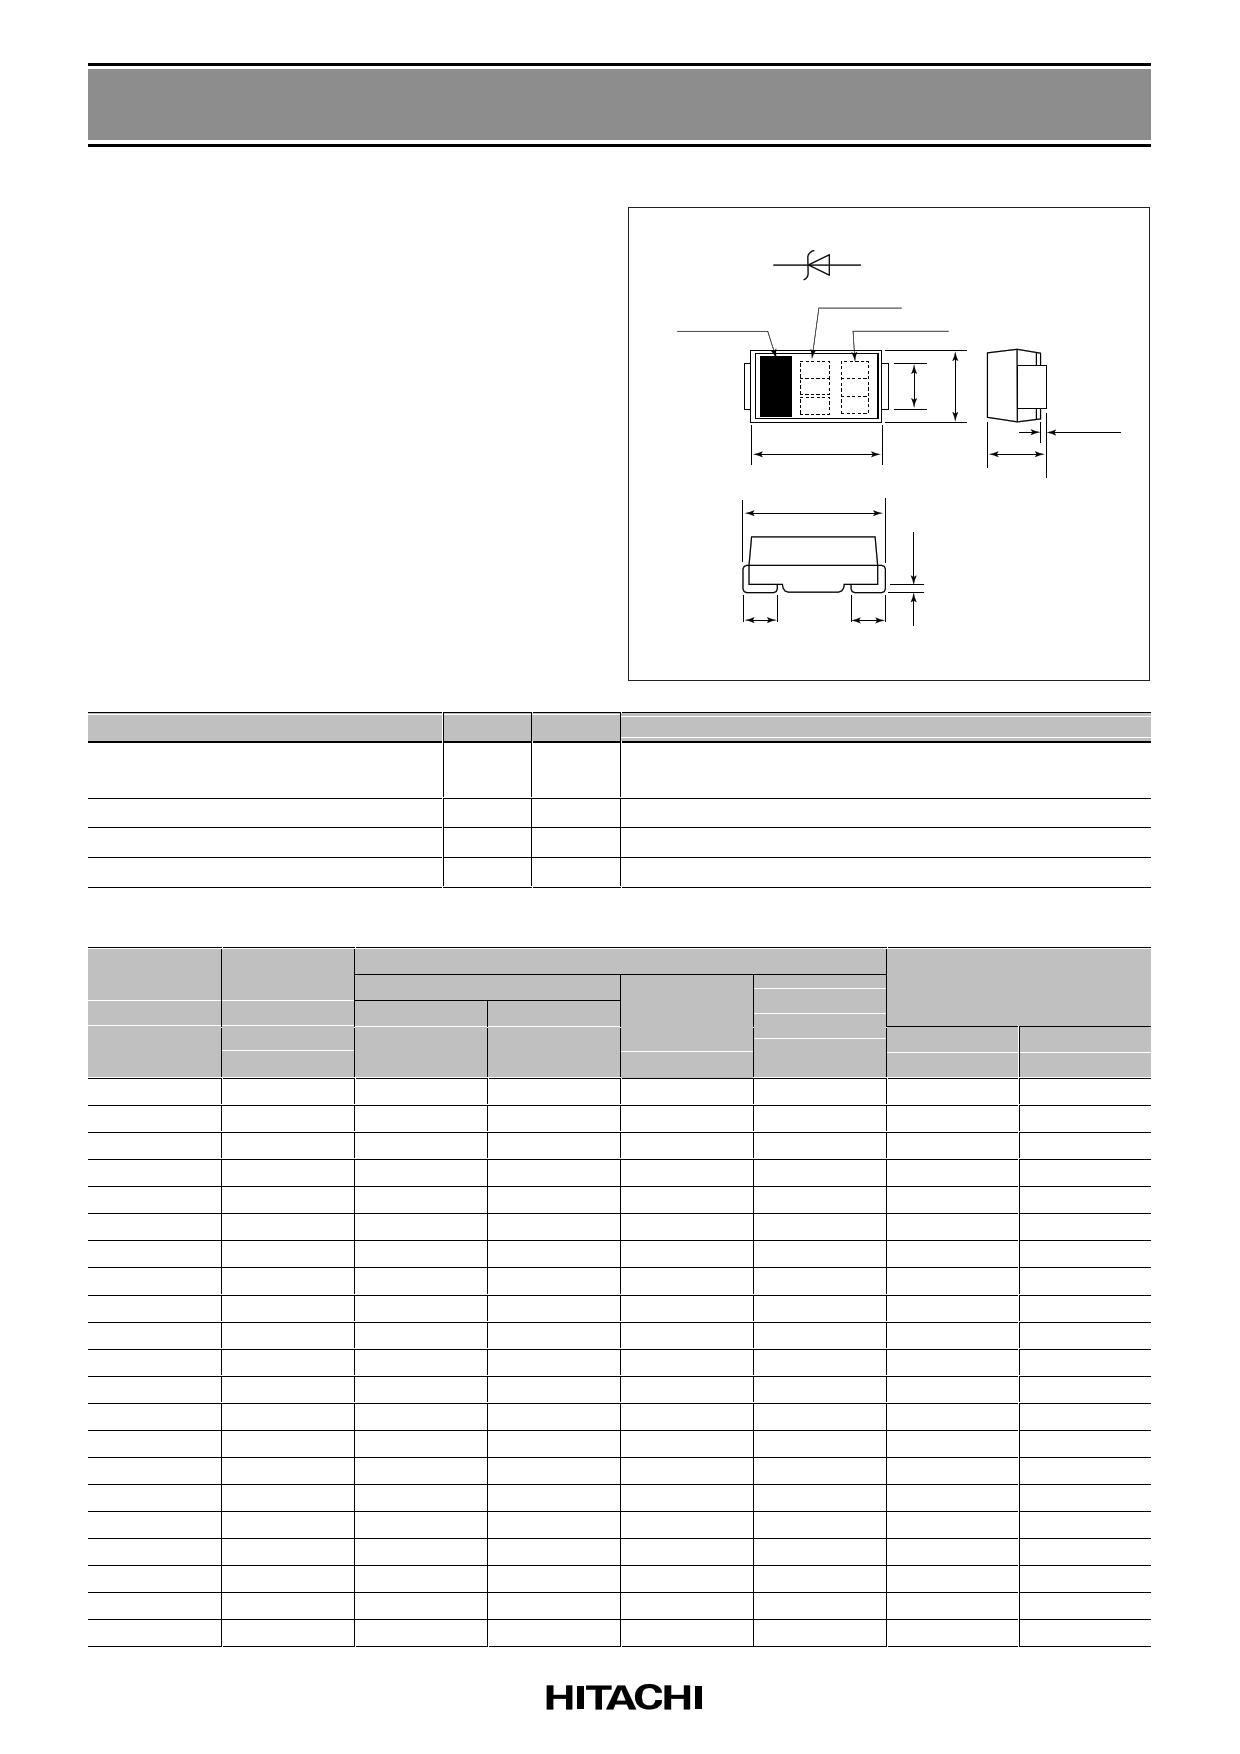 DAM3MA22 데이터시트 및 DAM3MA22 PDF